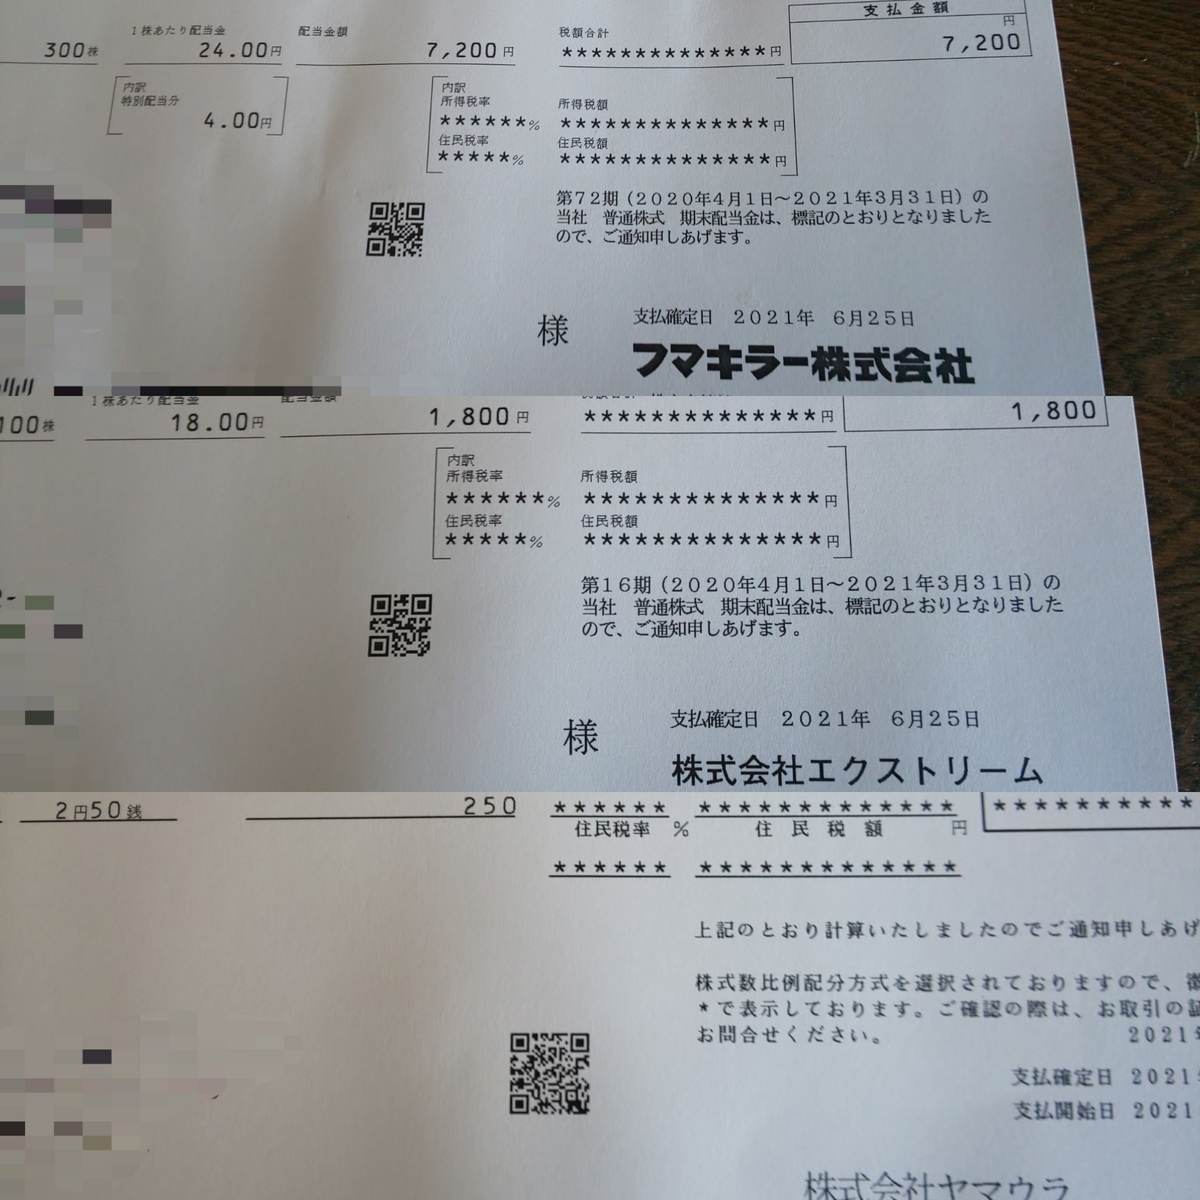 f:id:hyumama:20210703153703j:plain